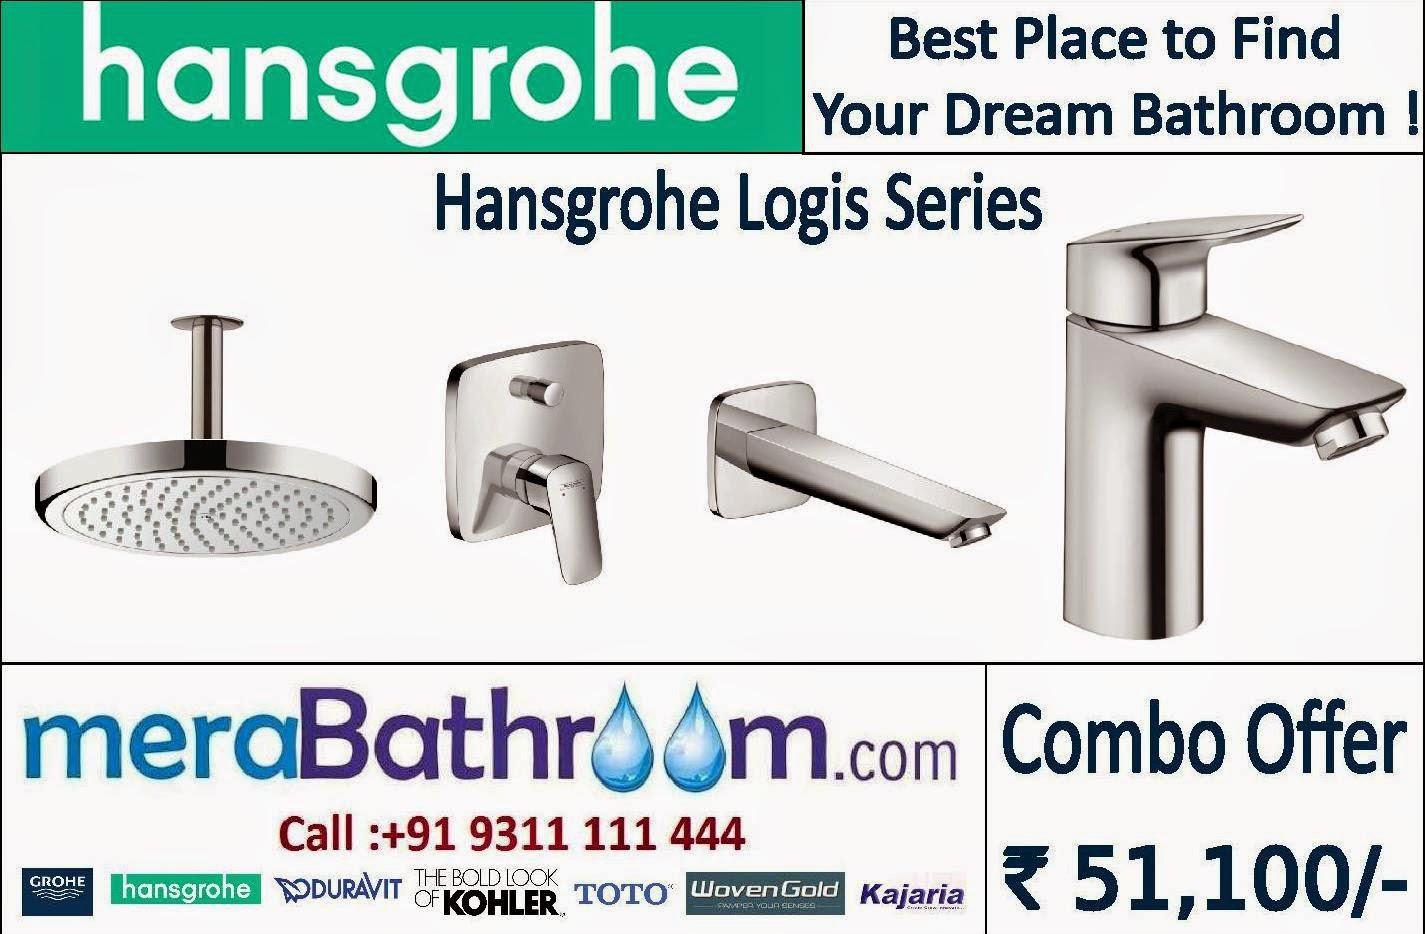 Erstaunlich Hansgrohe Logis Complete Bathroom | GROHE Bath Fitting RH78